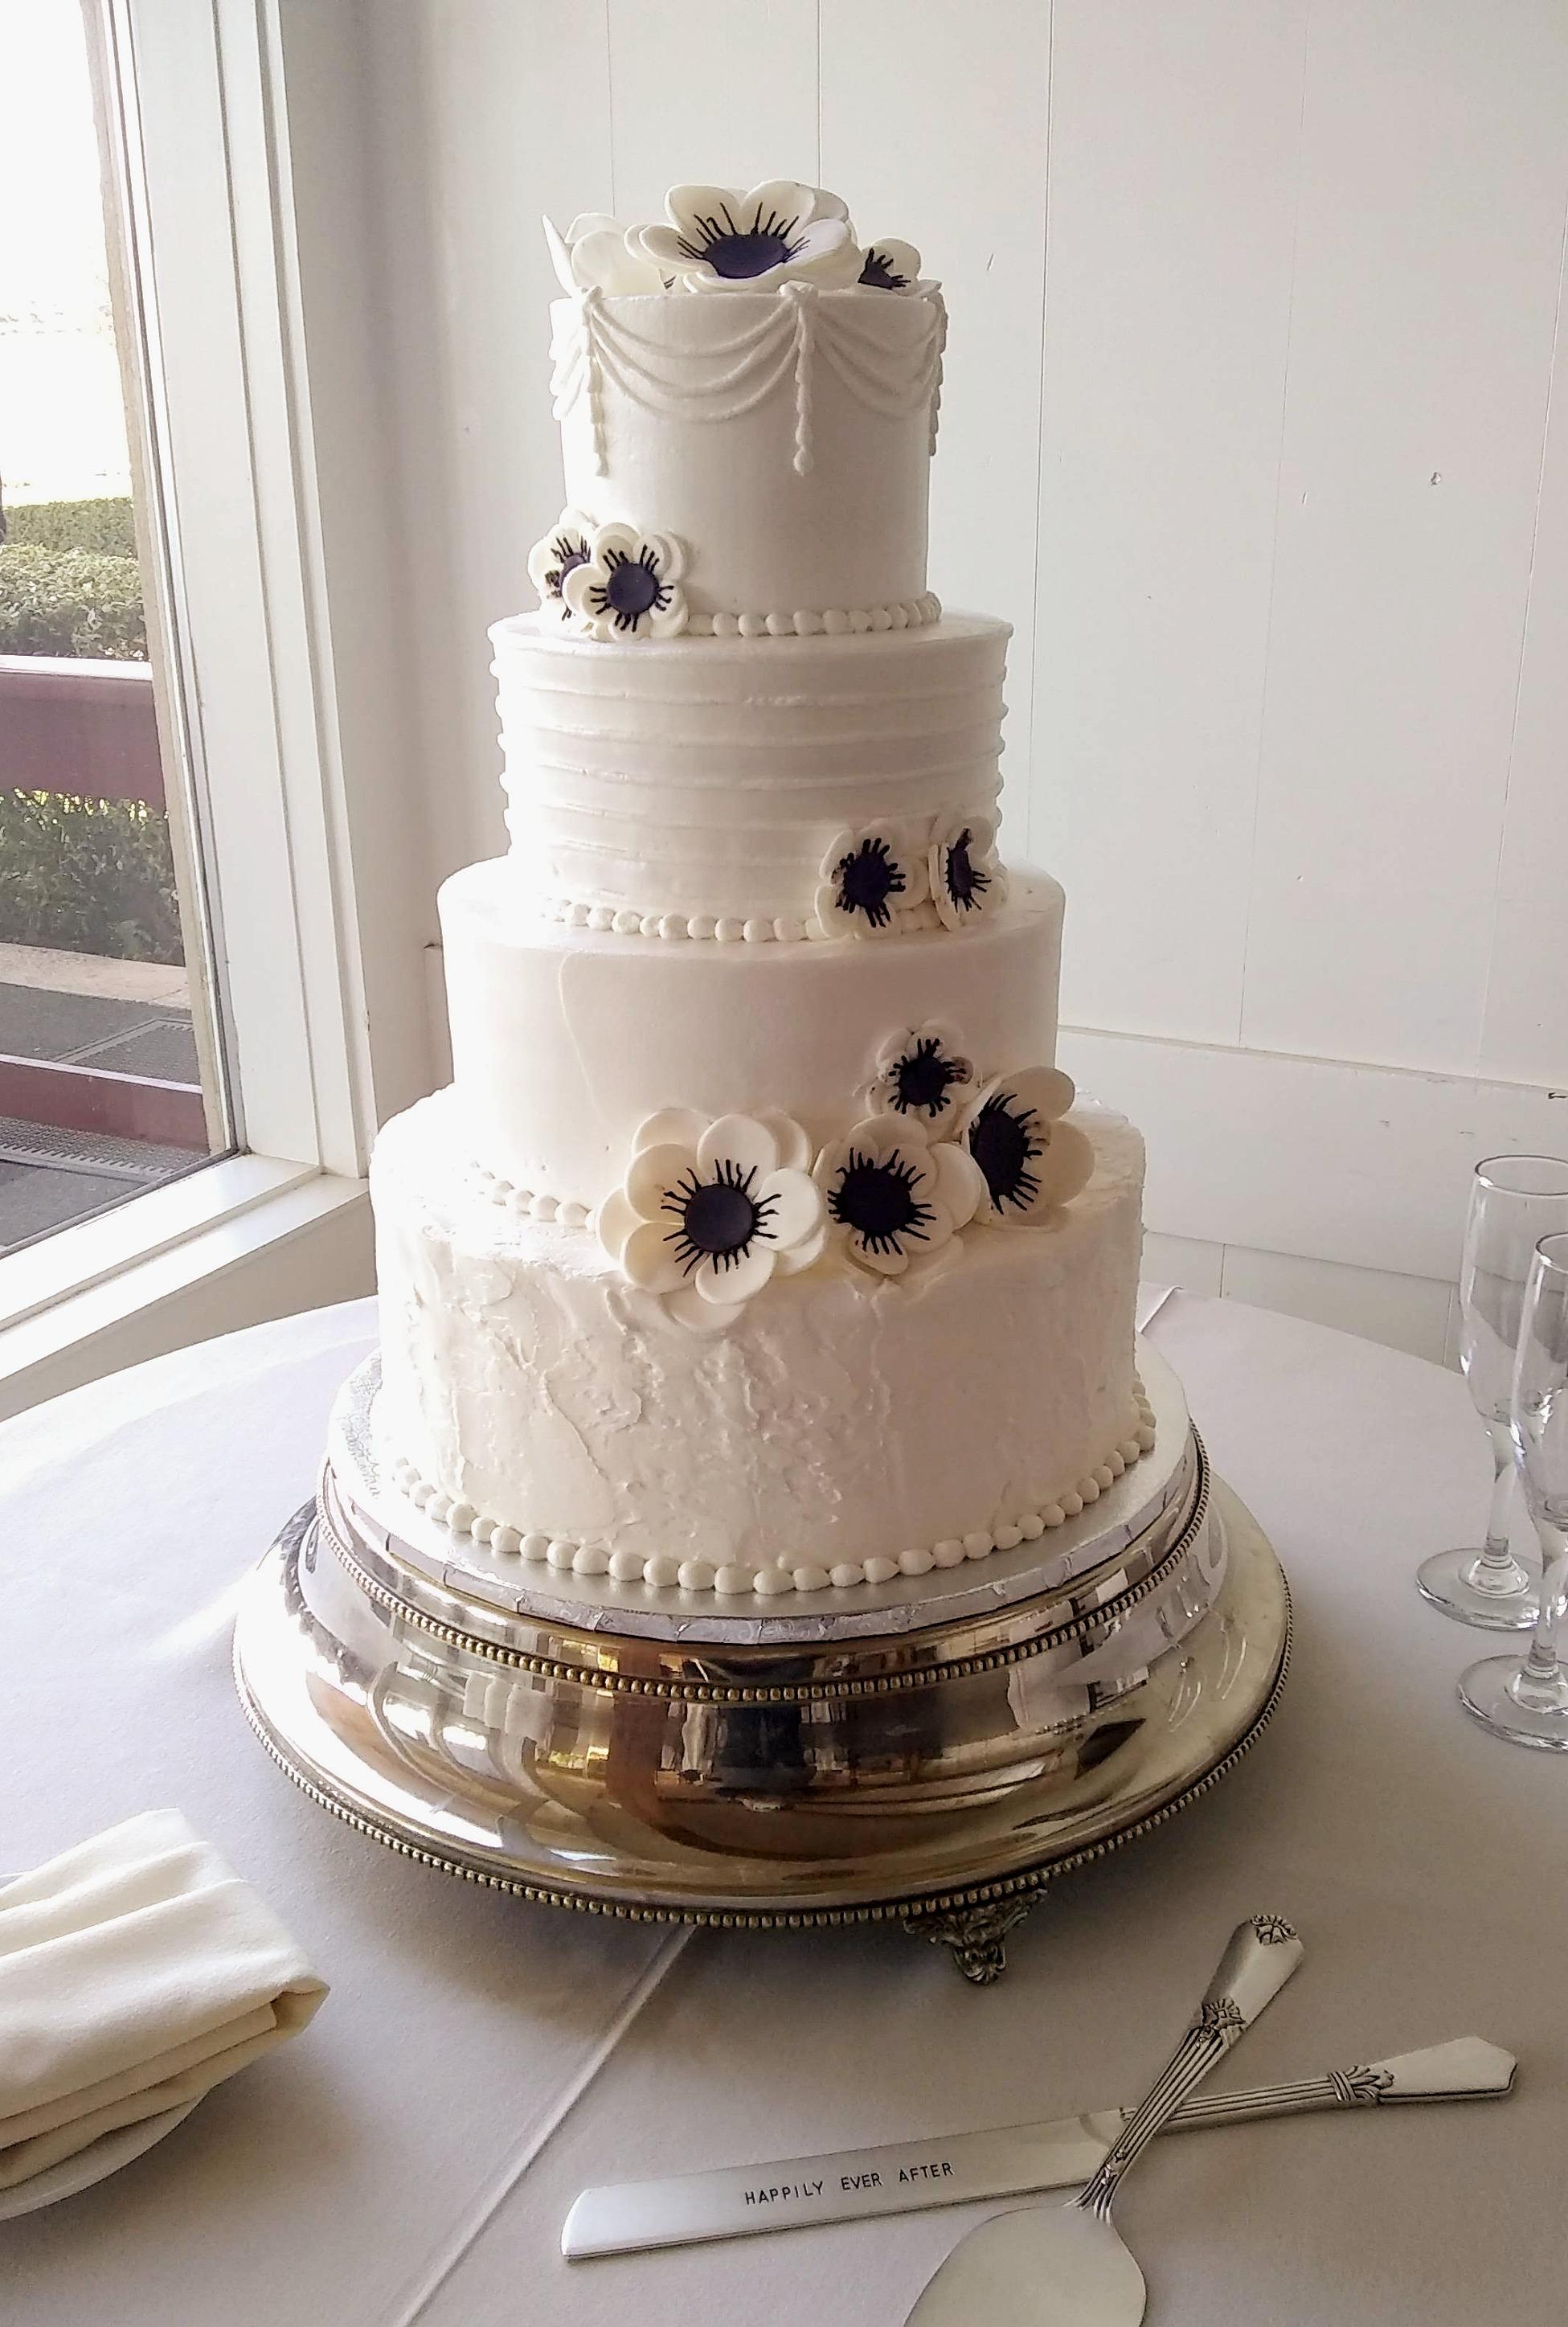 Wedding Cake Bakery Santa Rosa Ca Michele S Corner Wedding Cakes